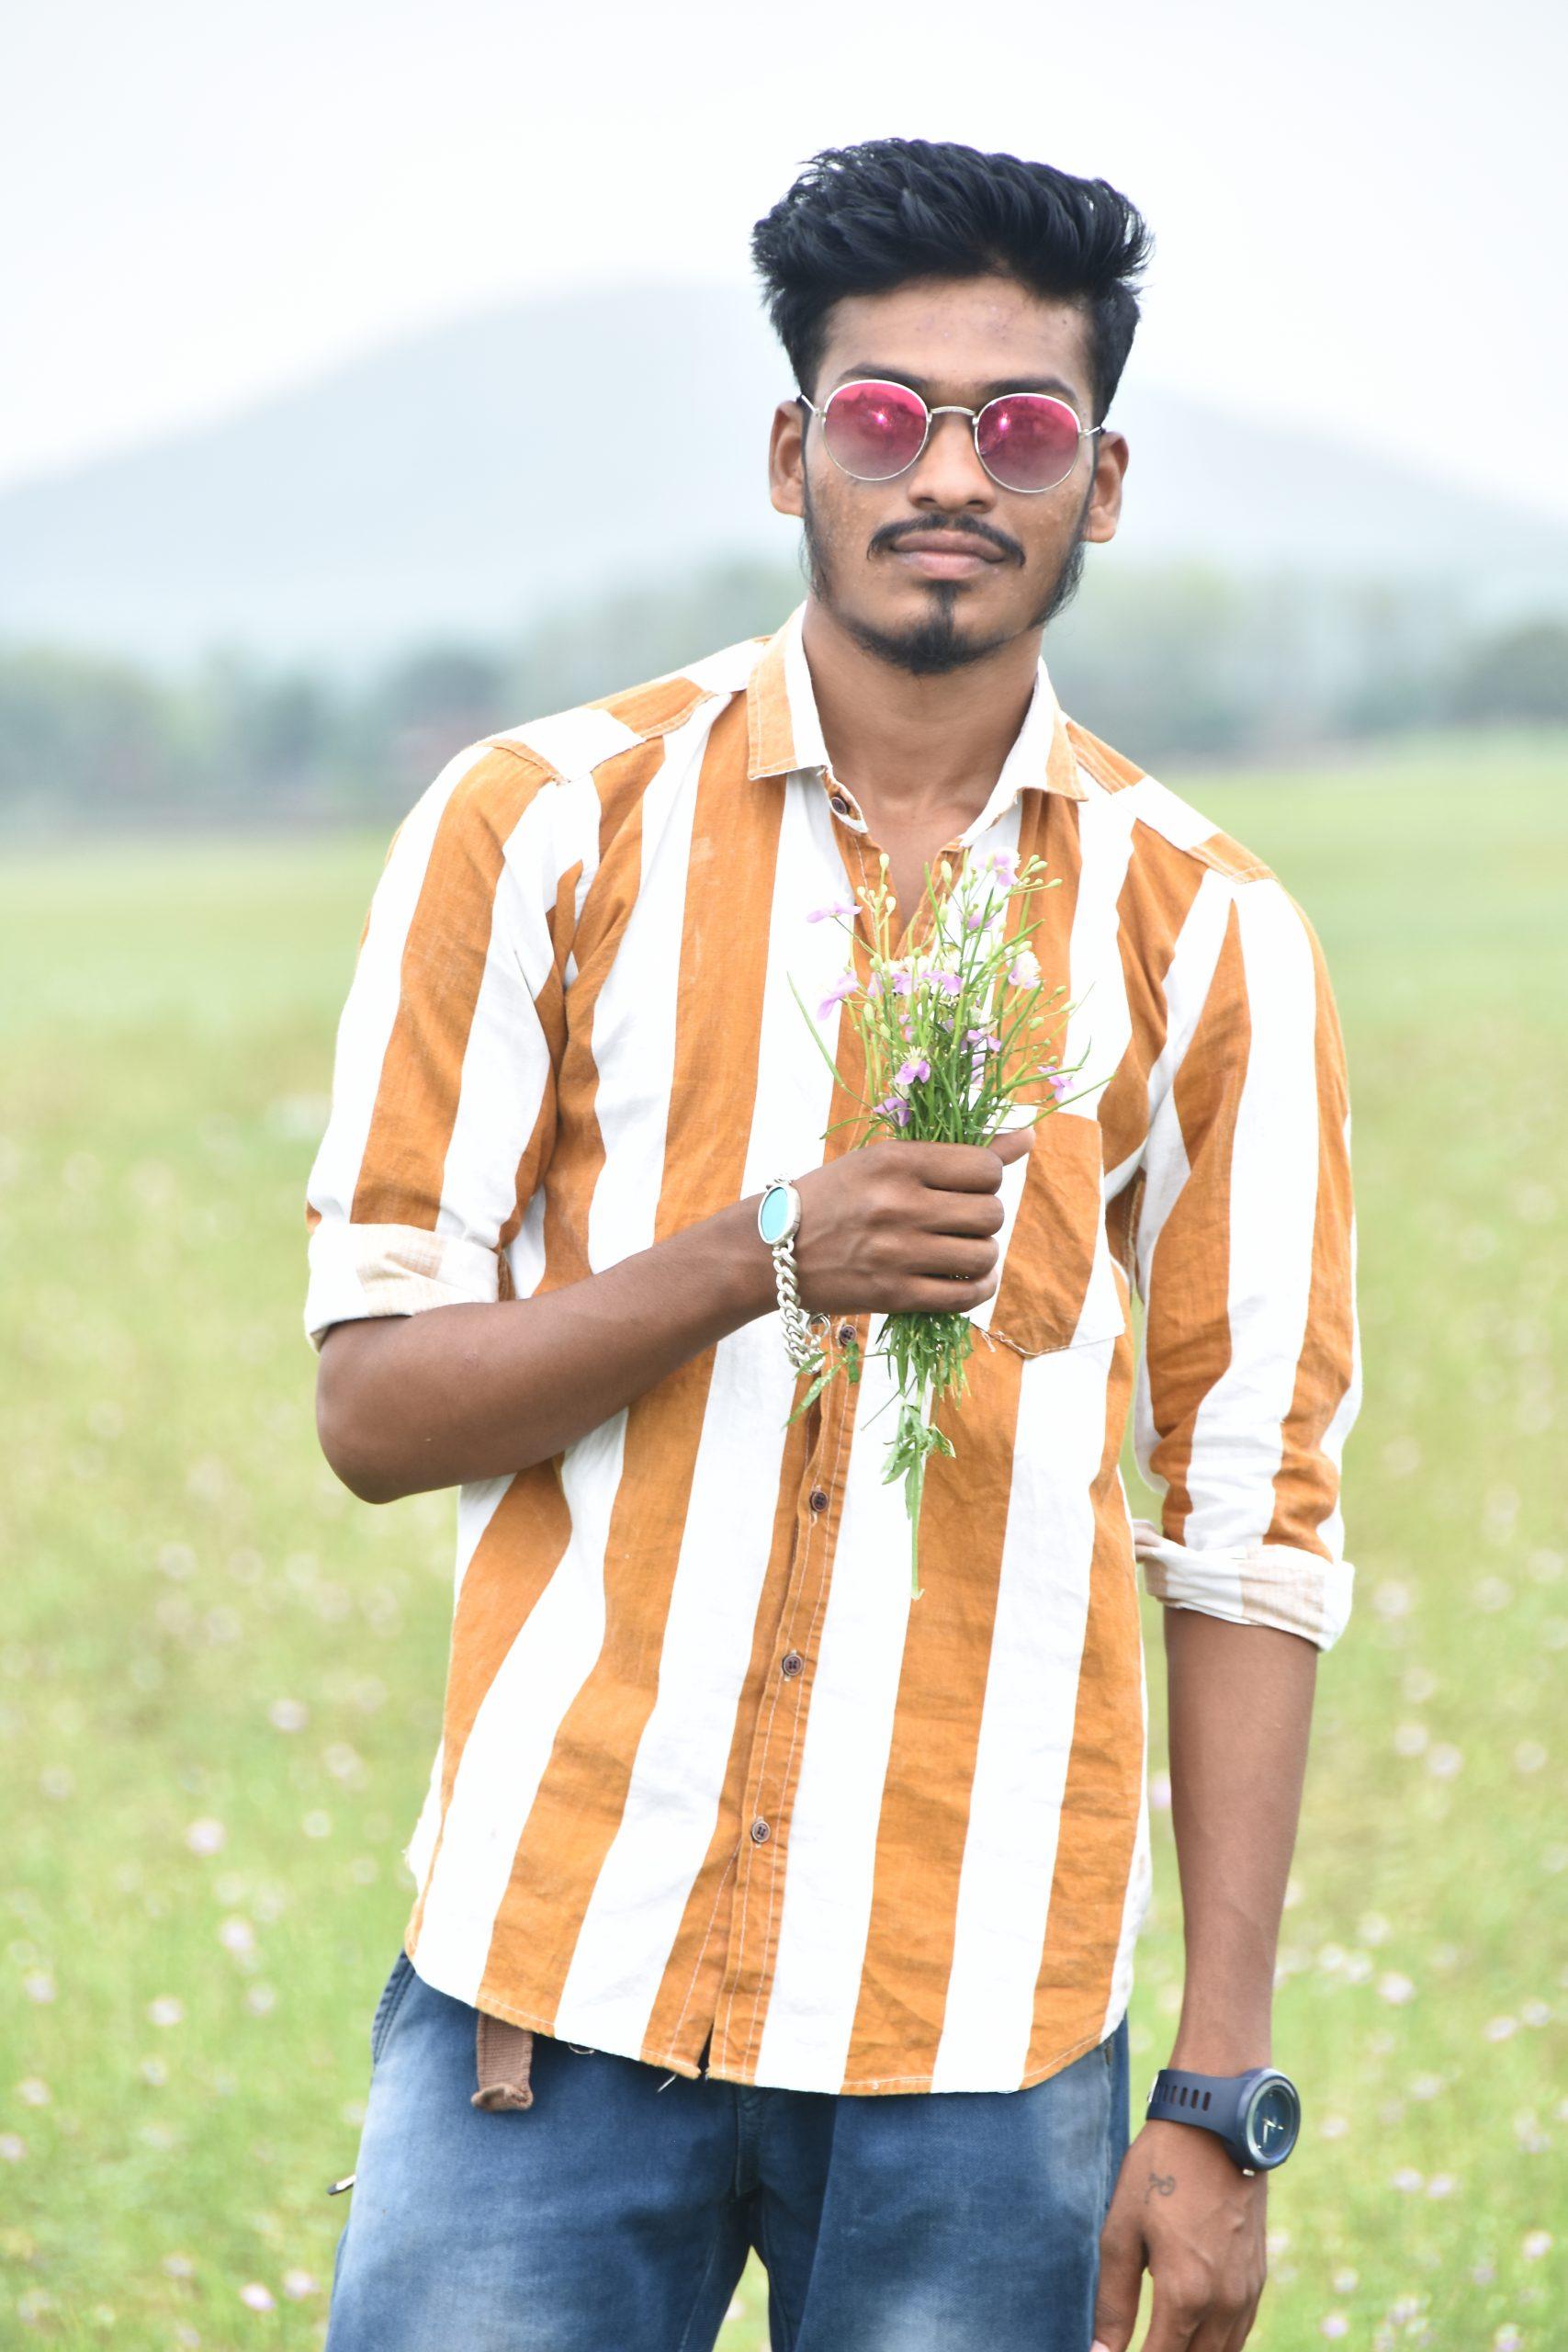 Boy posing with wild flowers